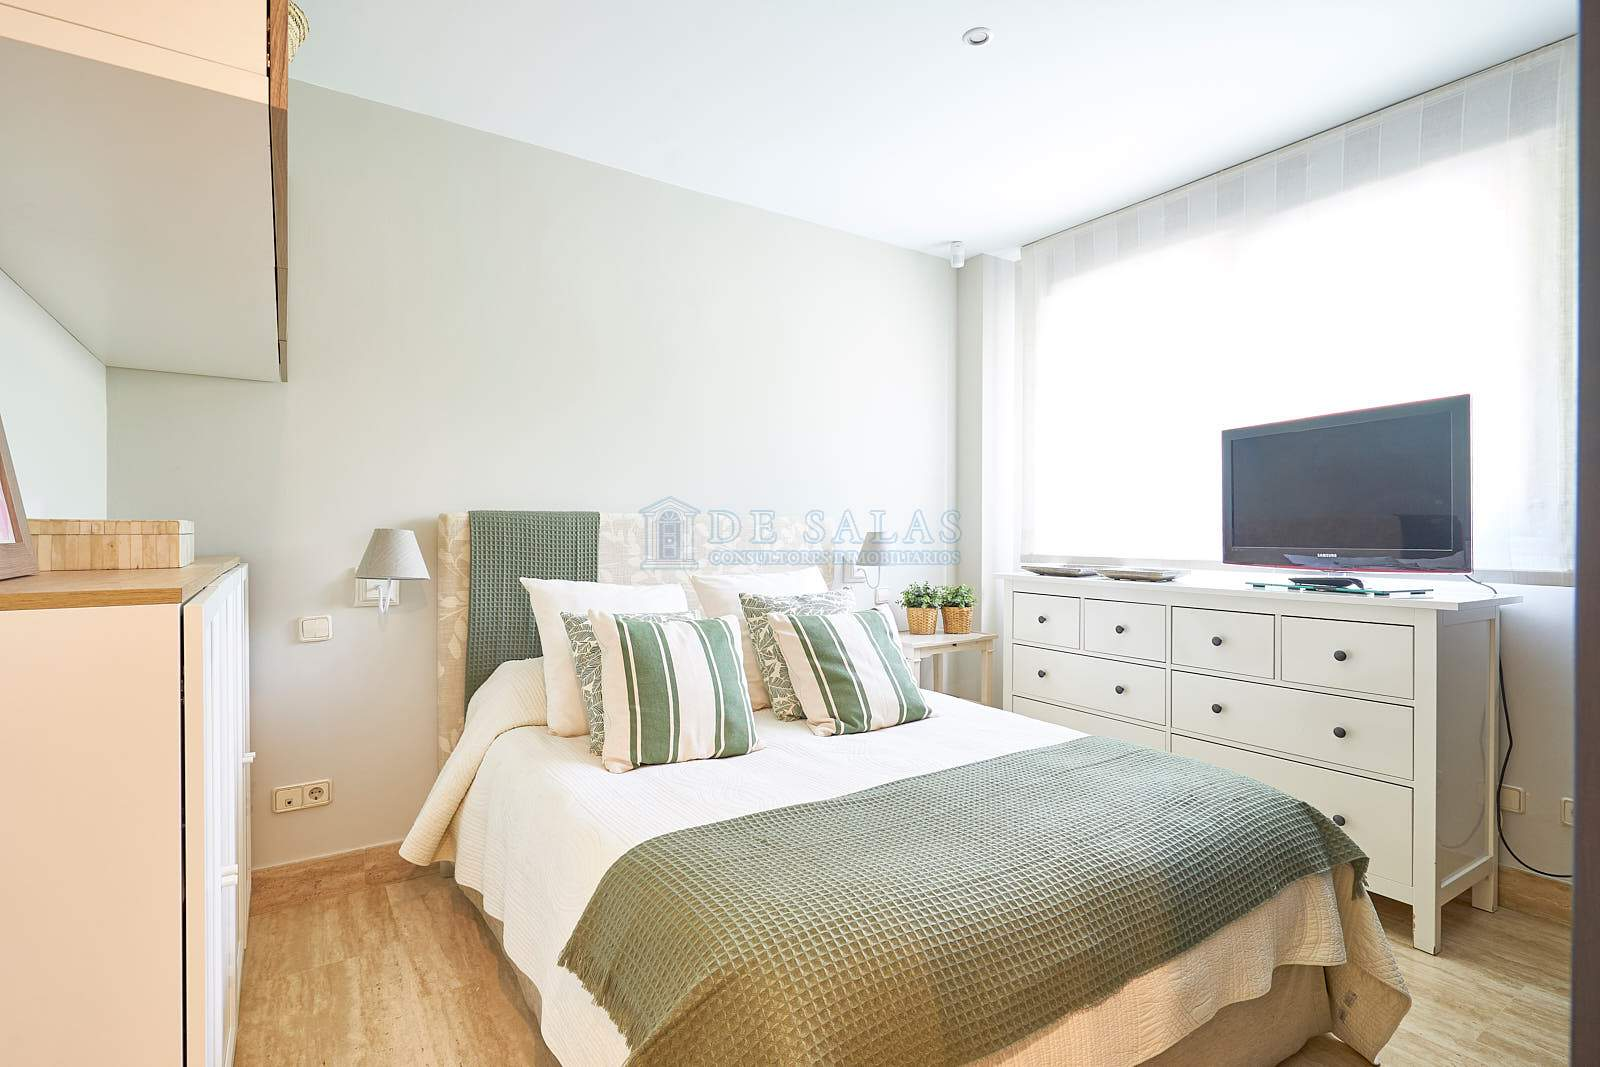 Dormitorio-020 Piso Soto de la Moraleja